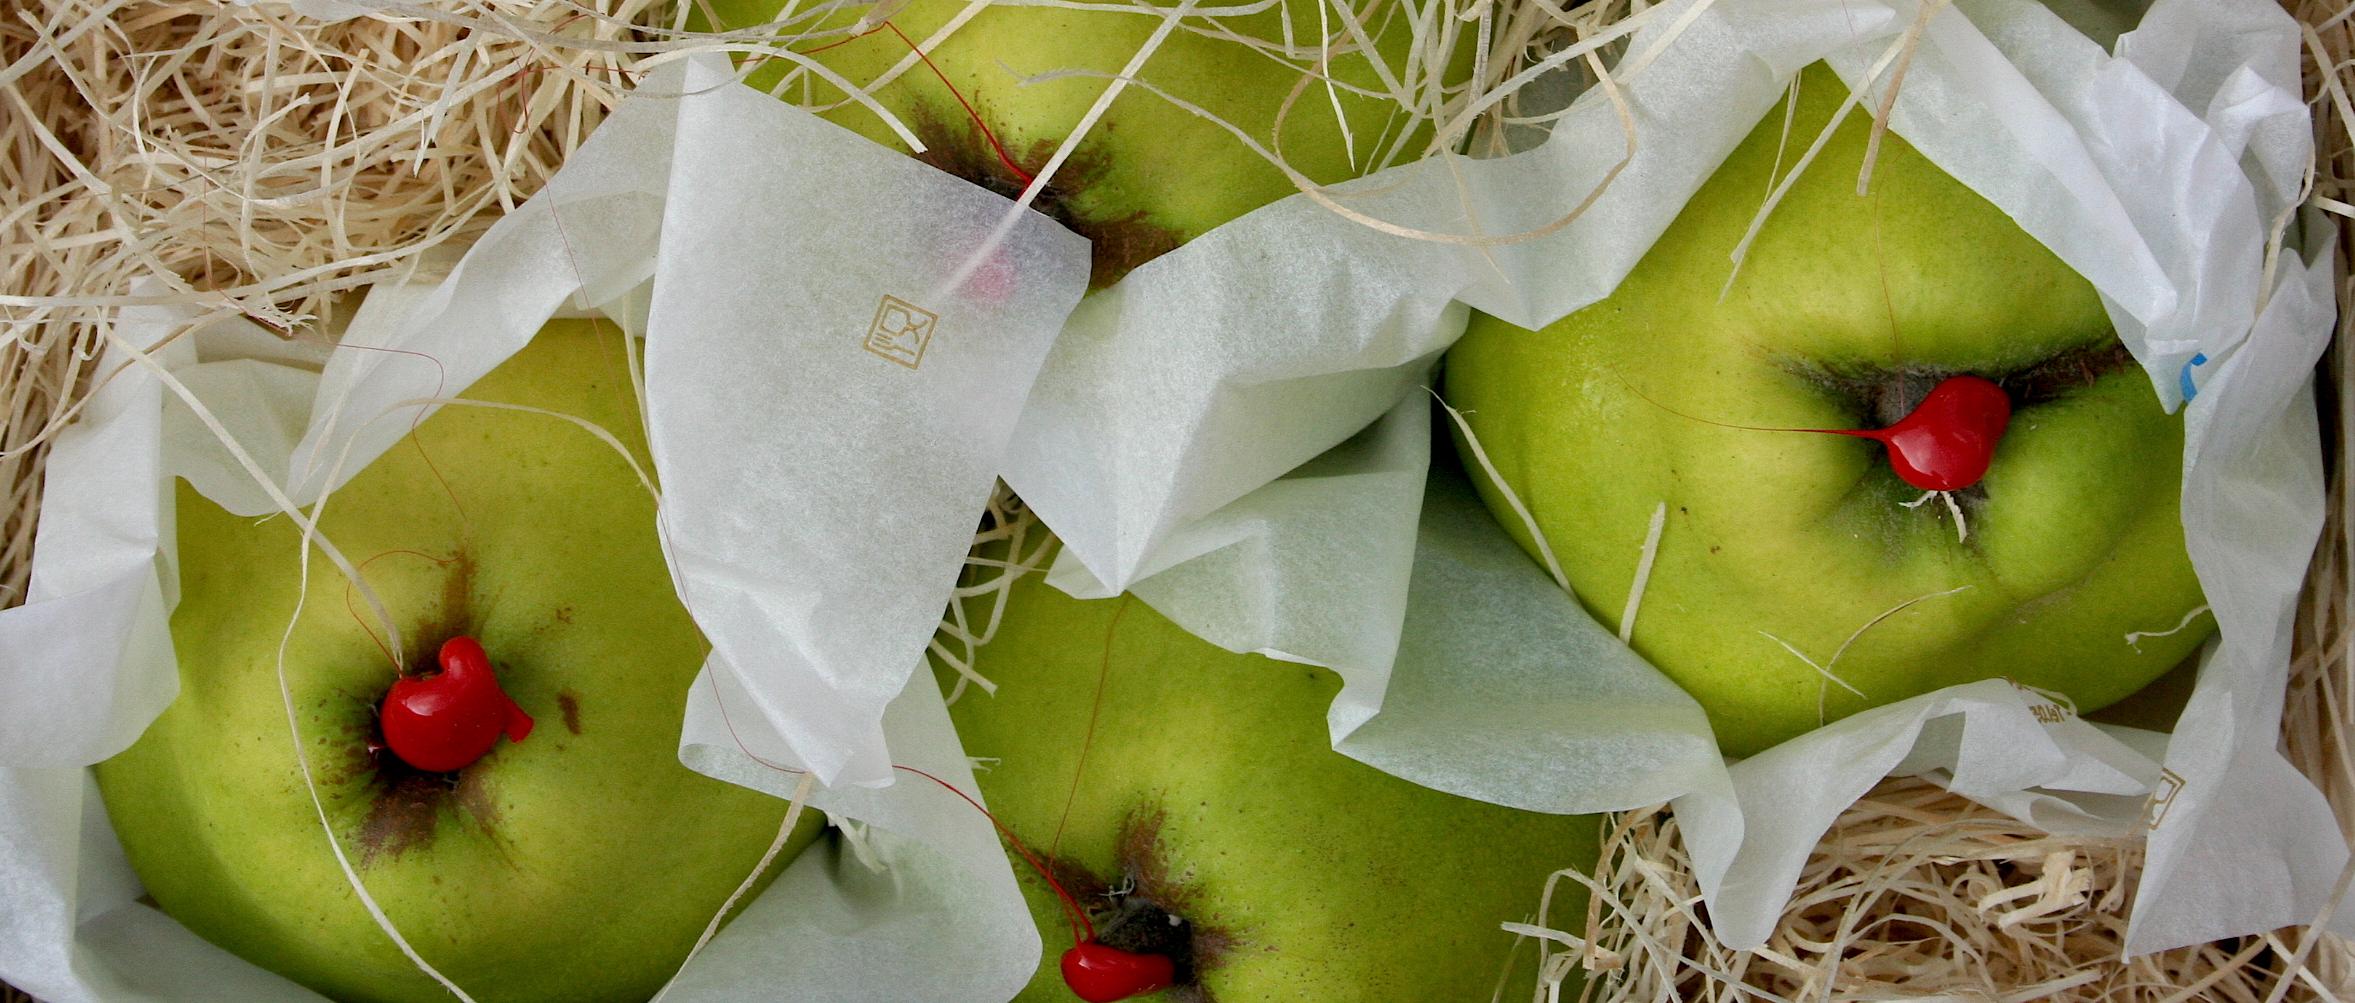 Tuscan pears.JPG